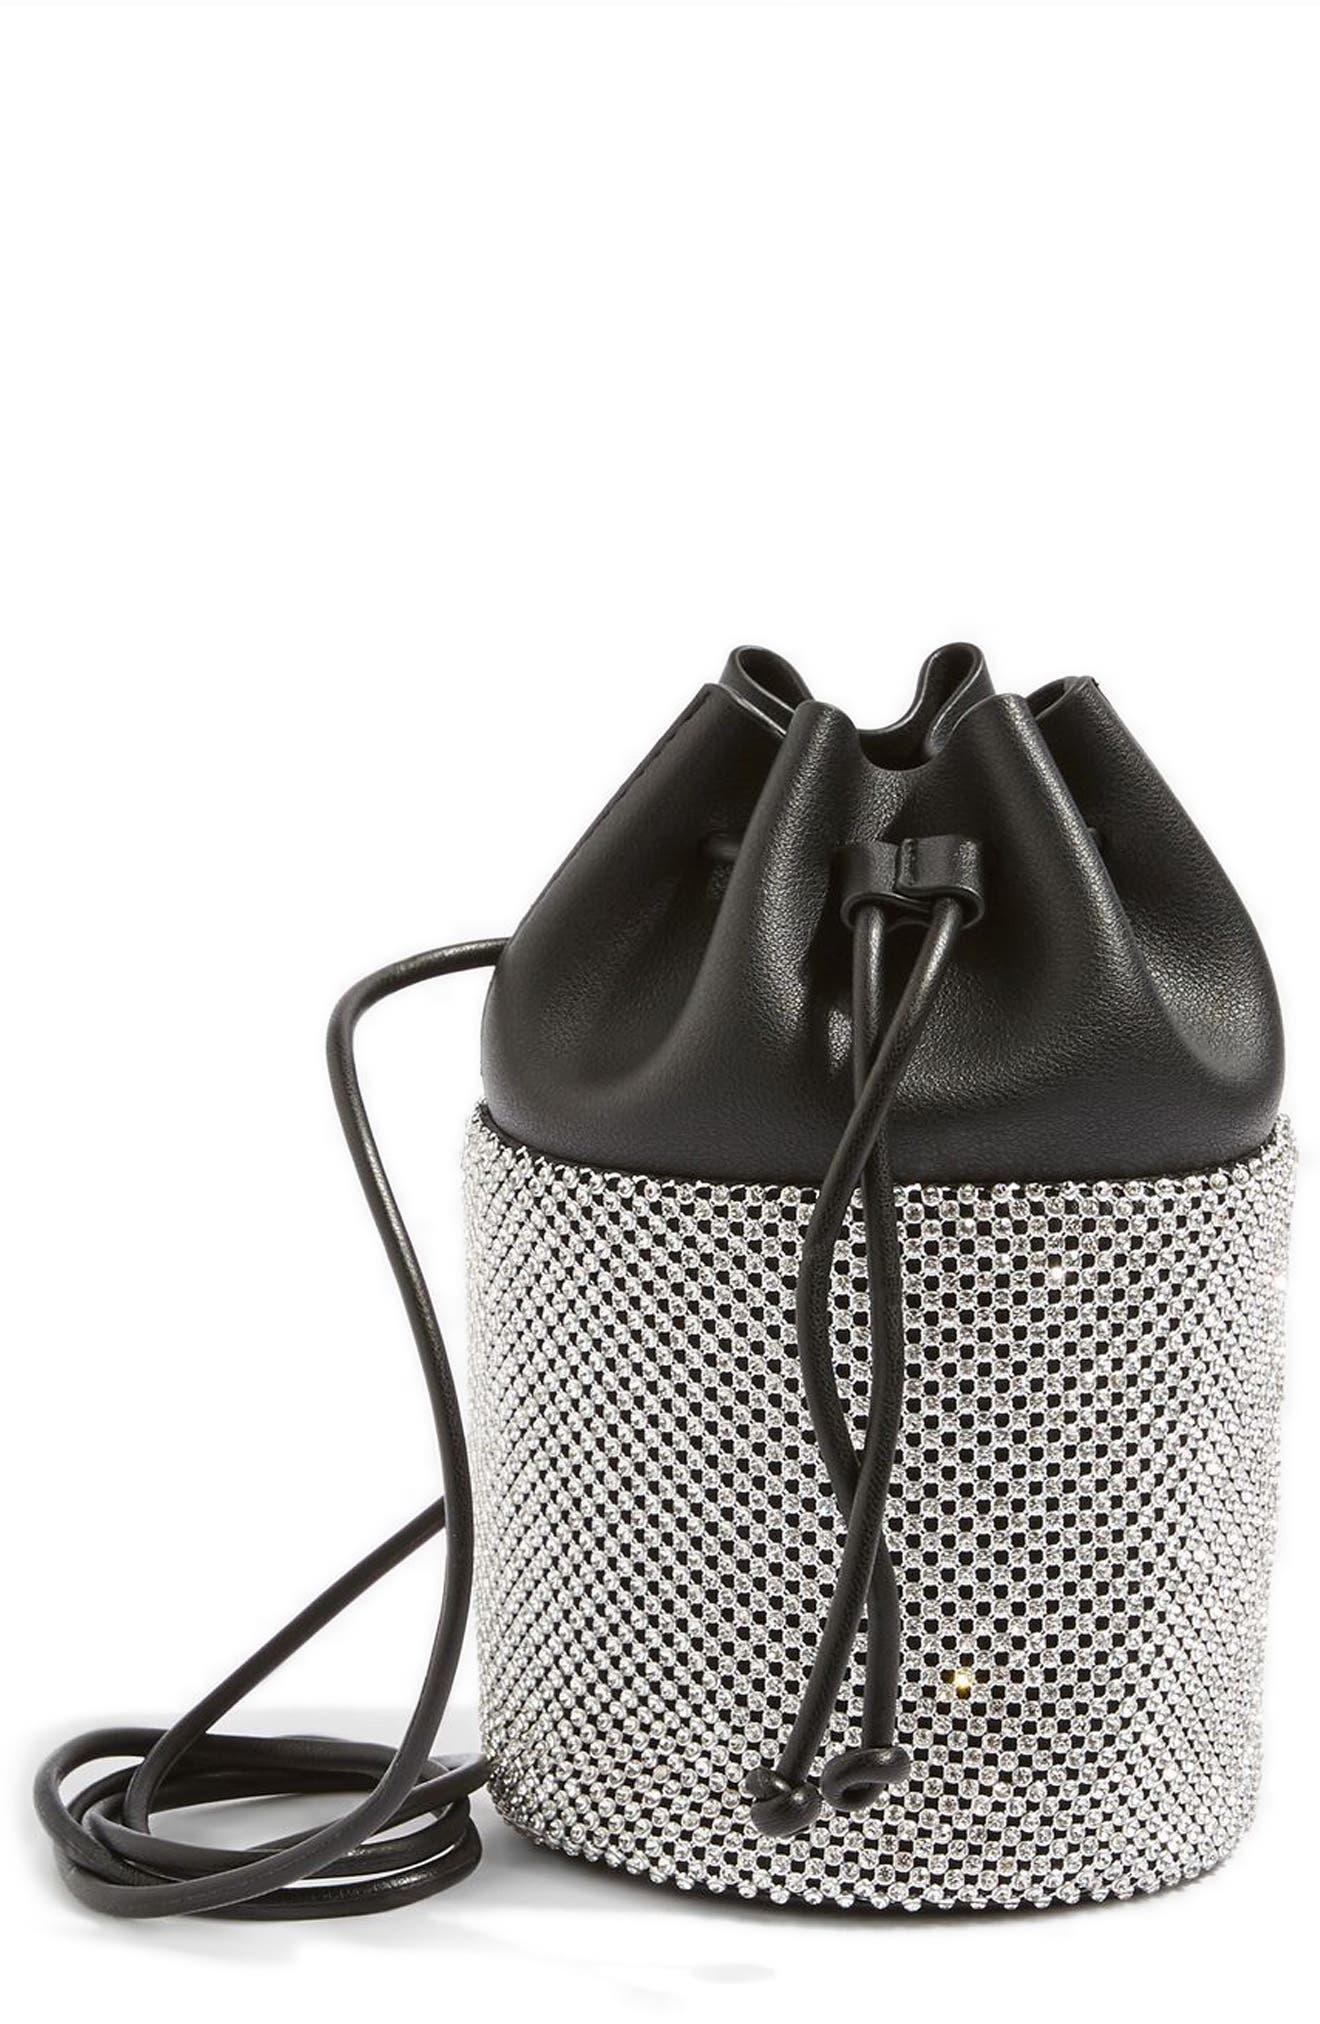 Main Image - Topshop Ruben Diamante Faux Leather Bucket Crossbody Bag